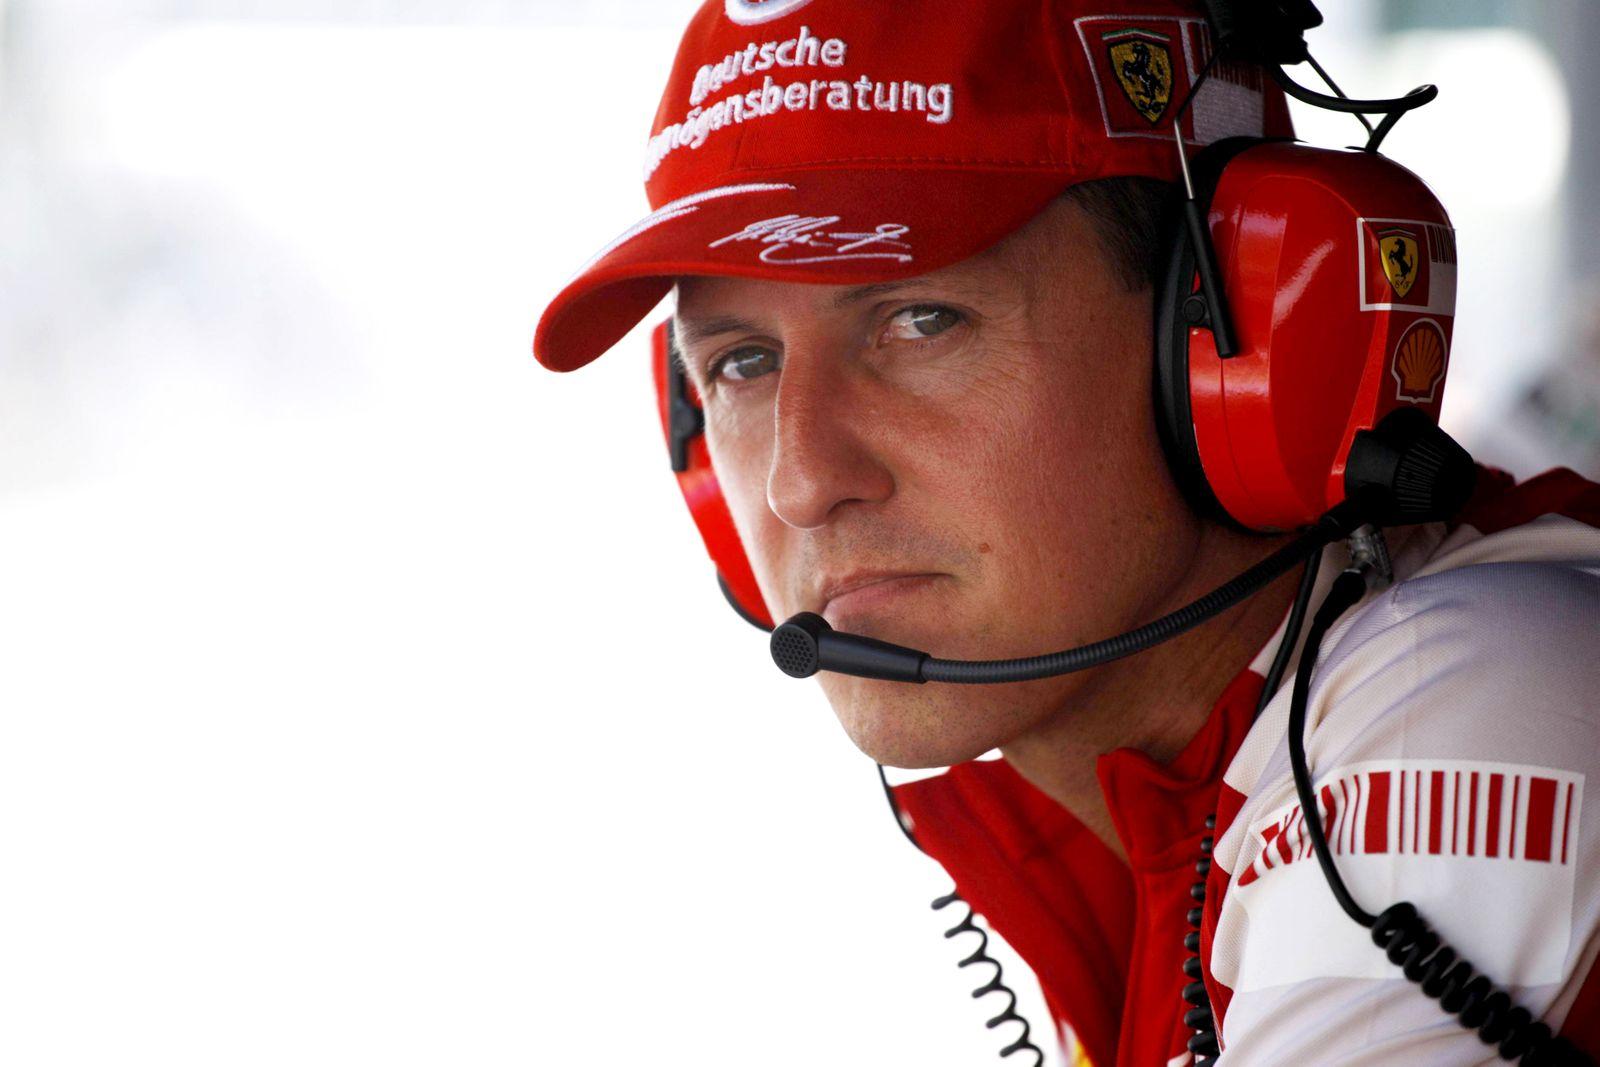 Berater Michael Schumacher (Deutschland / Ferrari)